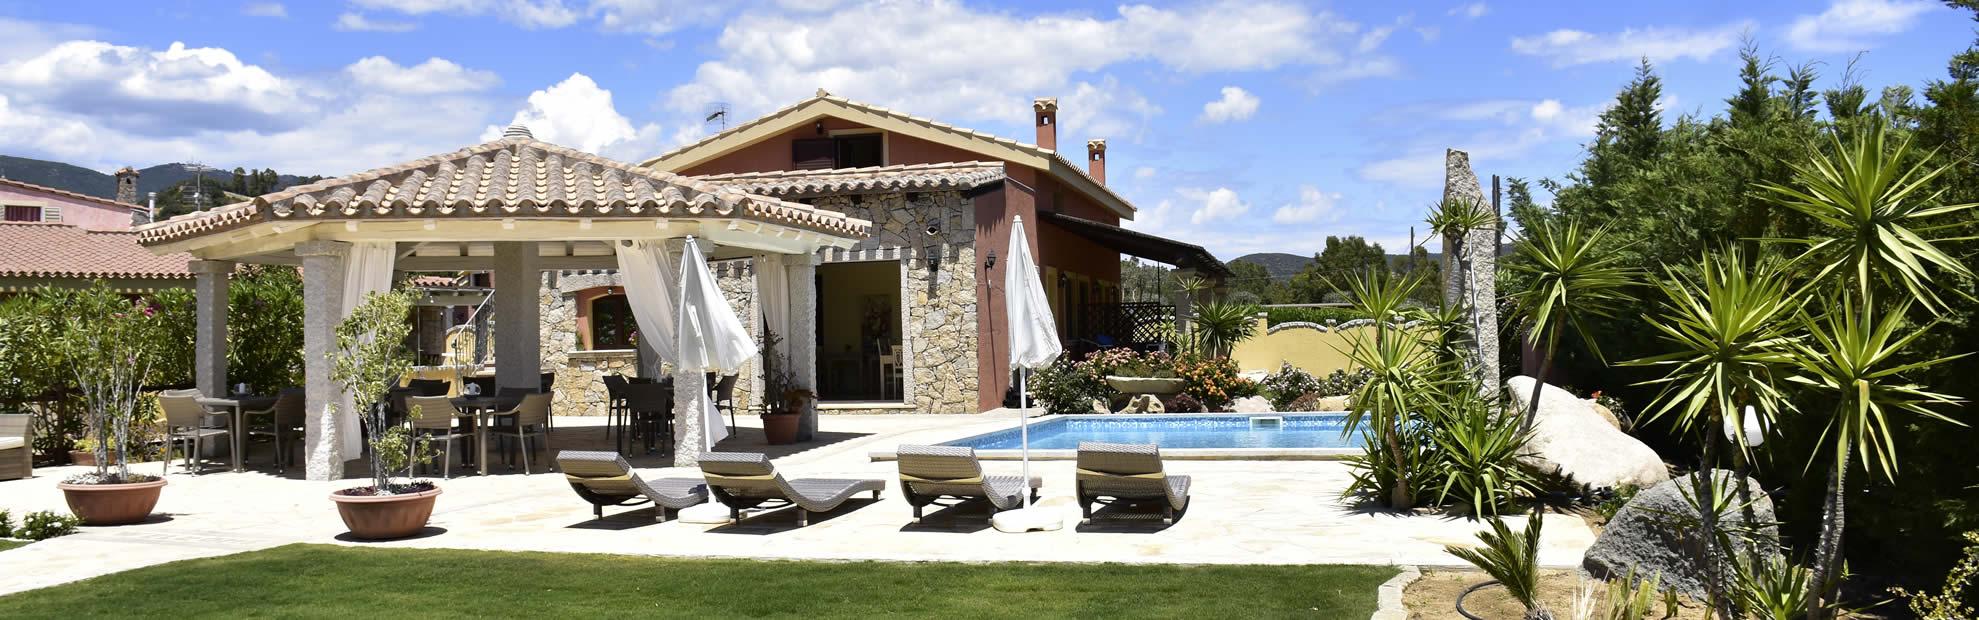 Bed & Breakfast I Graniti Sardi Villasimius - HotelB&B Villasimius slideshow